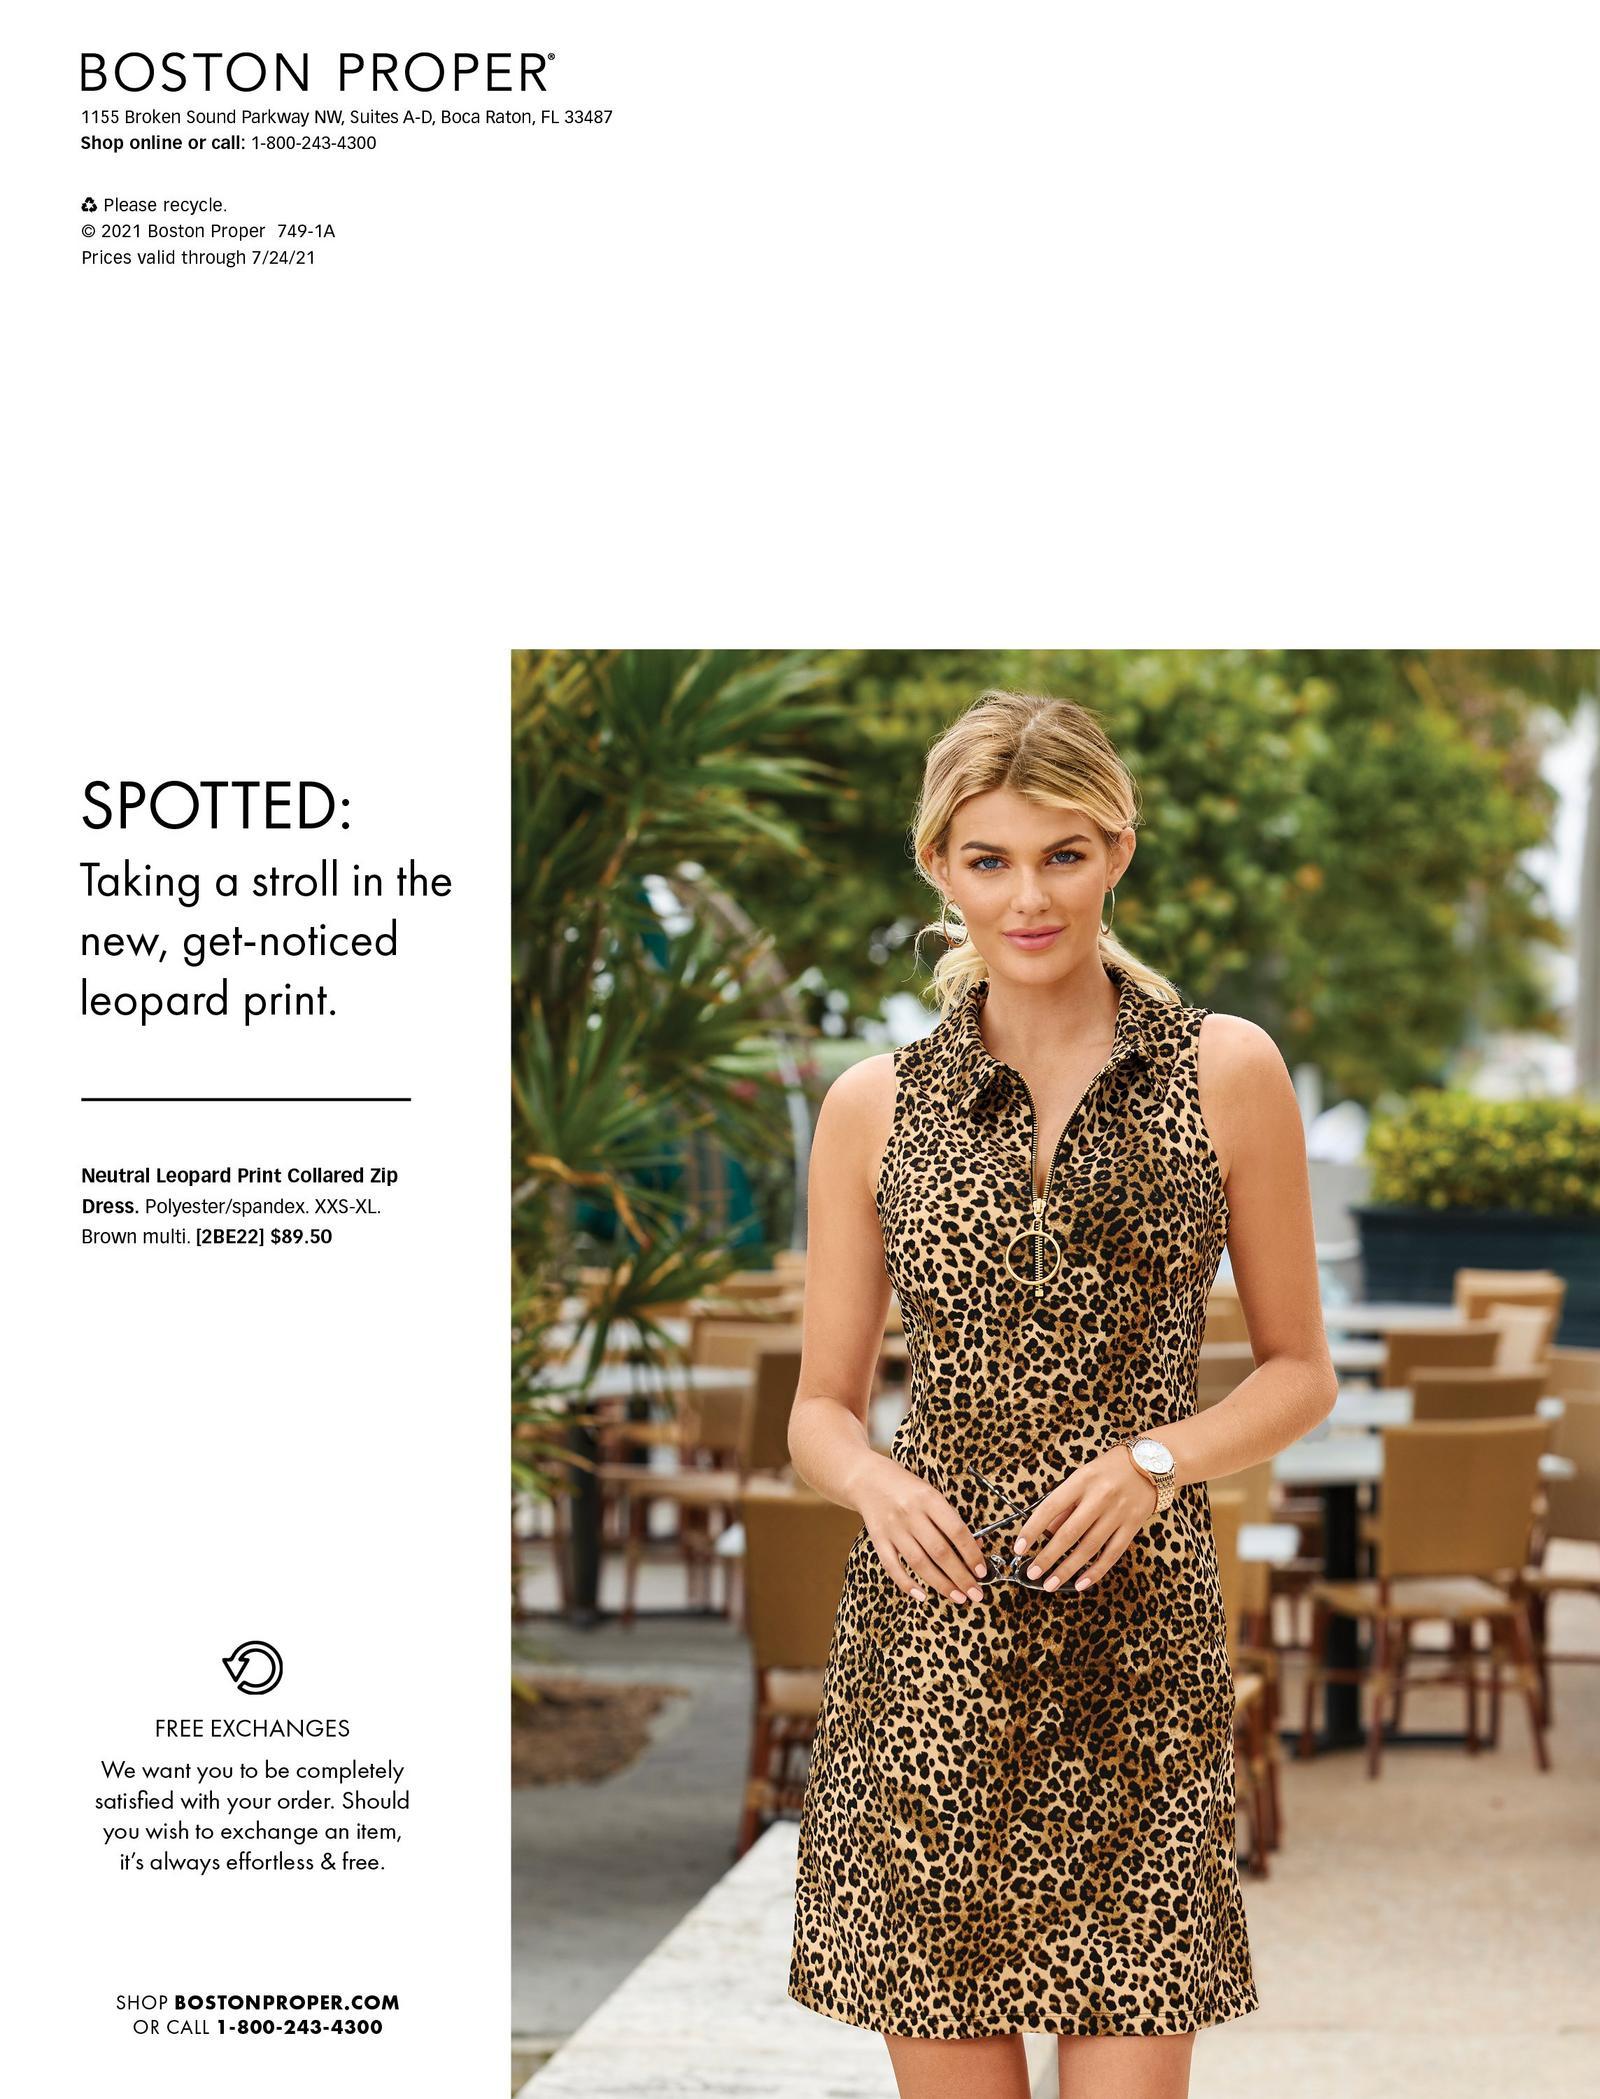 model wearing a leopard print sleeveless collared sports dress.